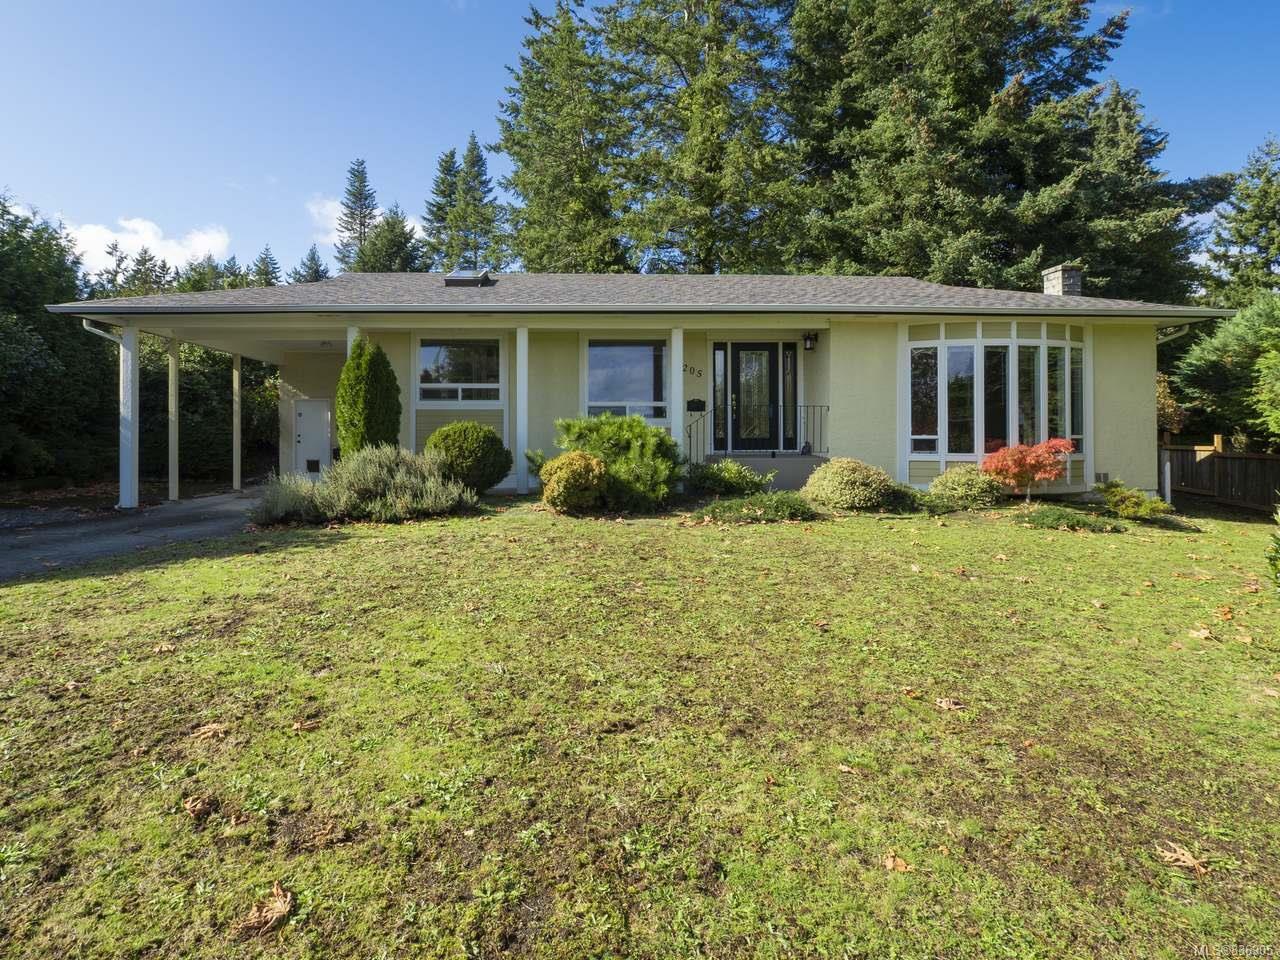 Main Photo: 205 Seagull Lane in NANAIMO: Na Departure Bay House for sale (Nanaimo)  : MLS®# 836905